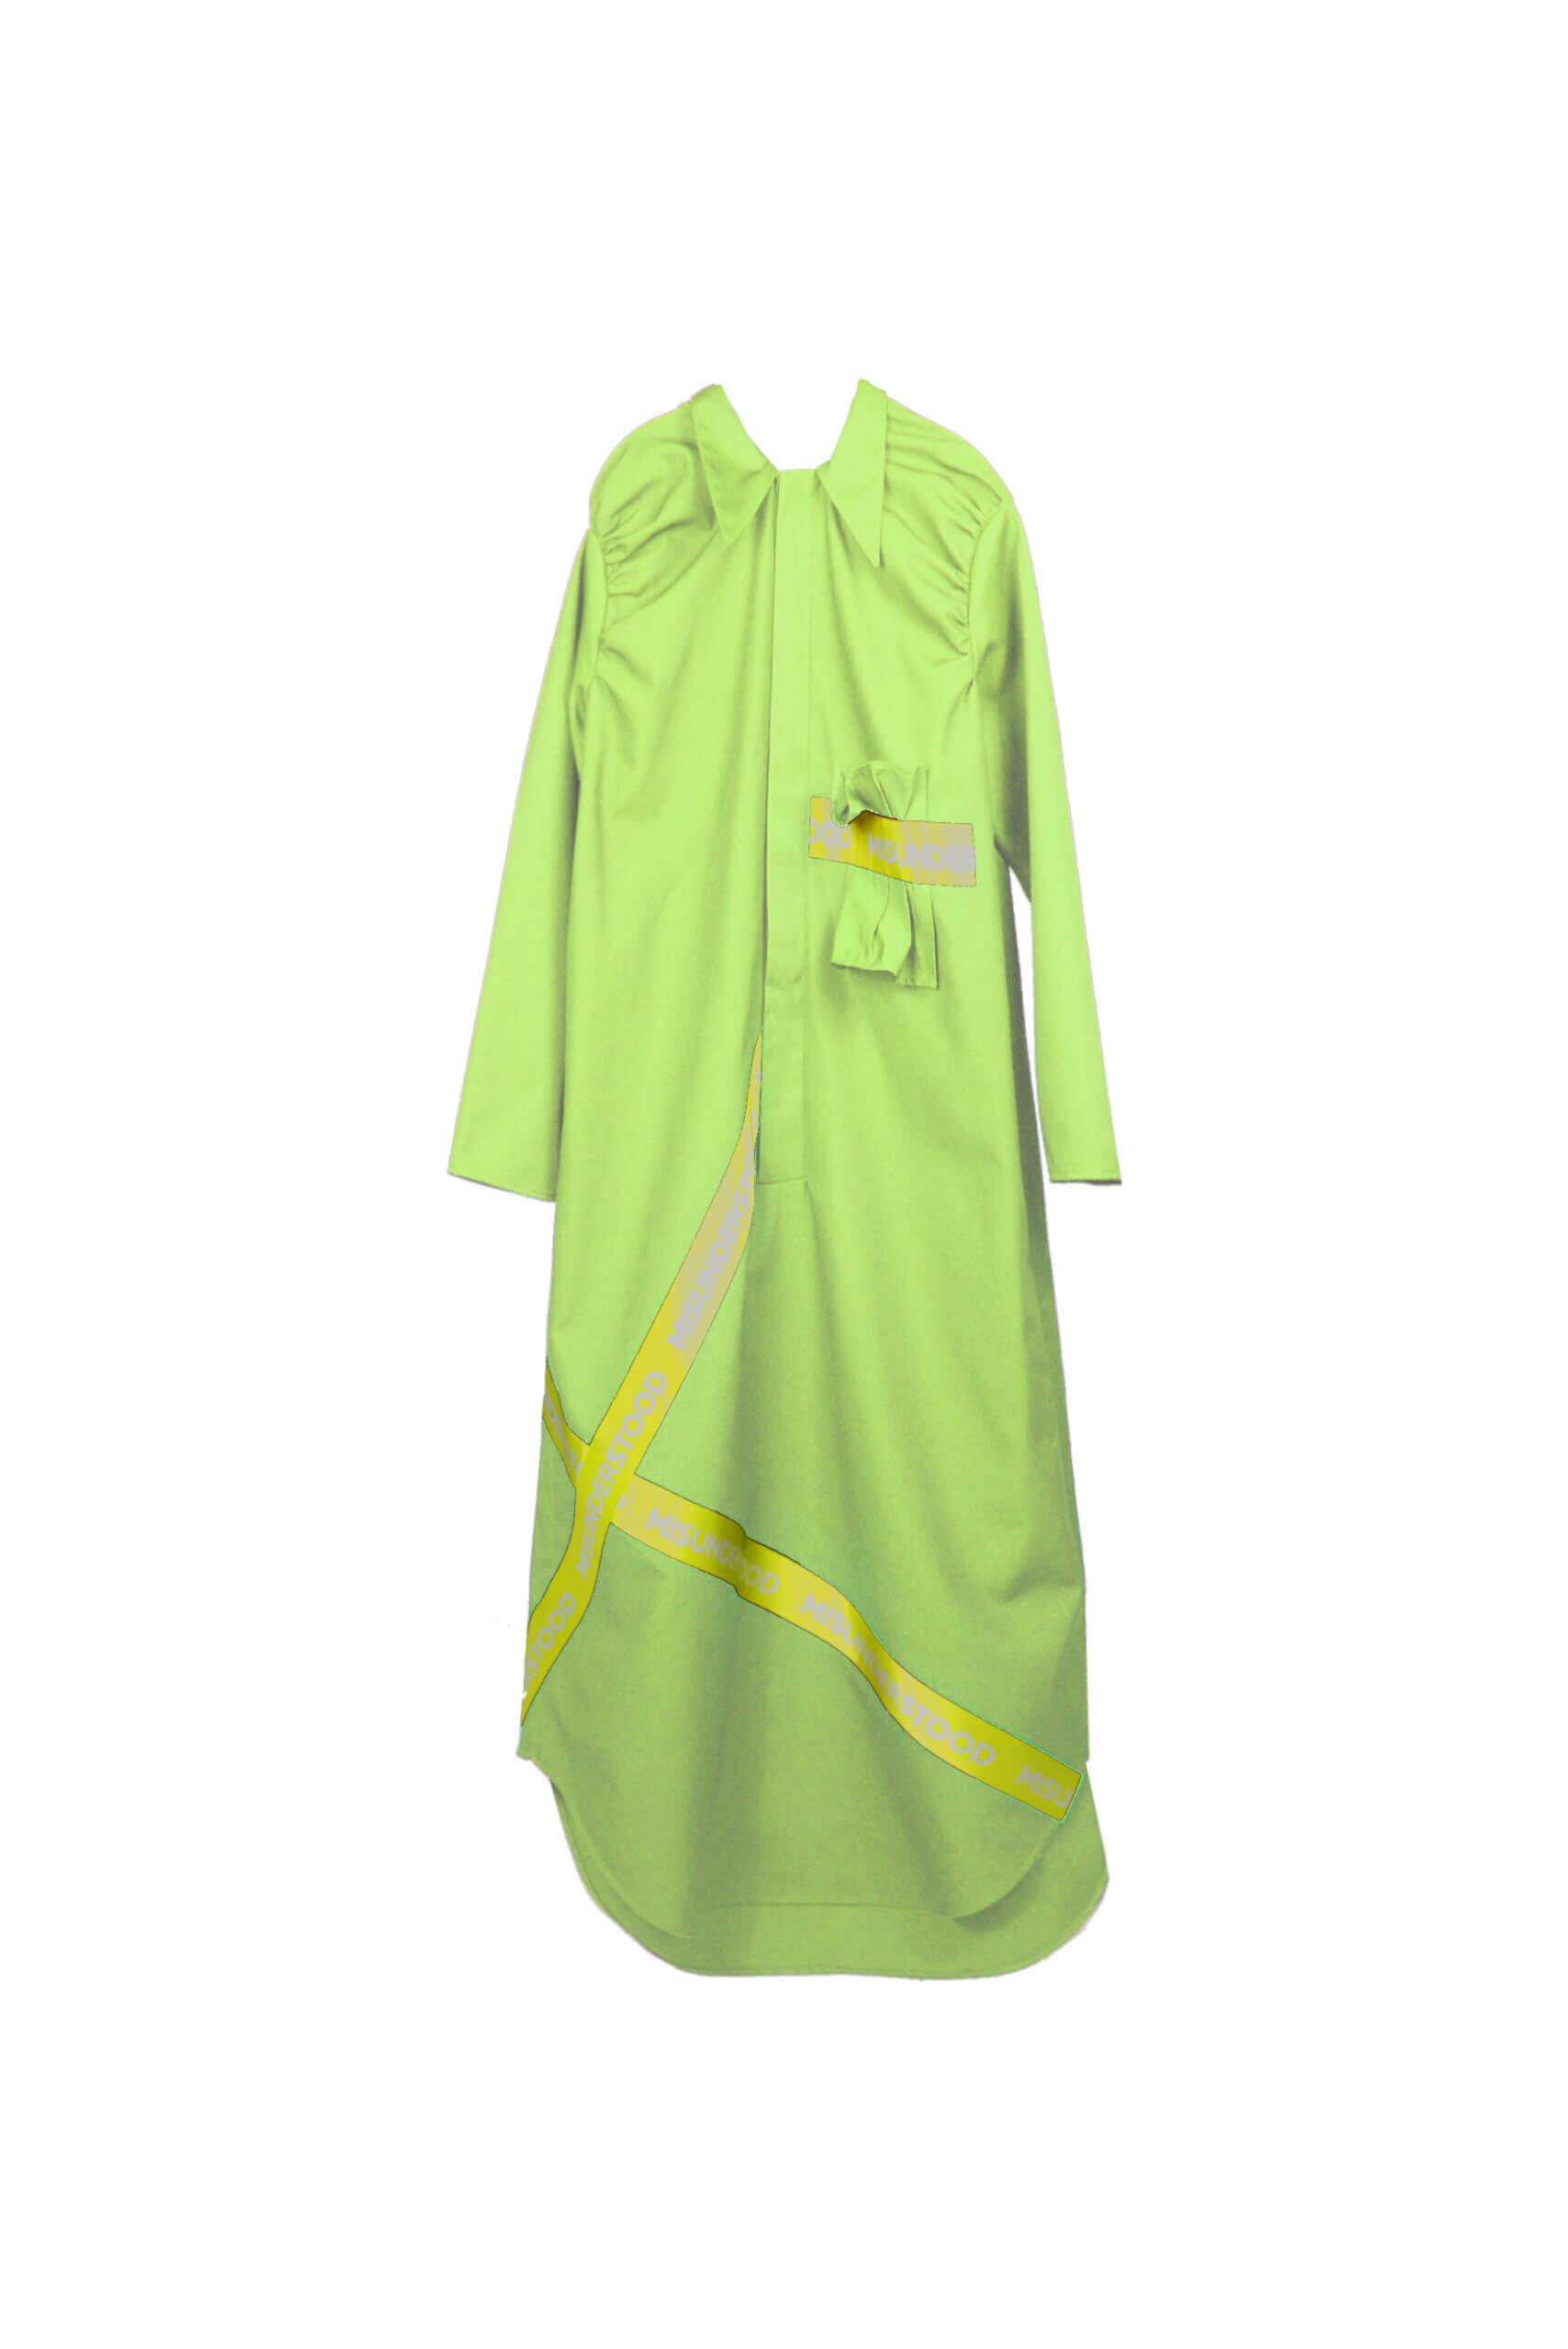 front dress green